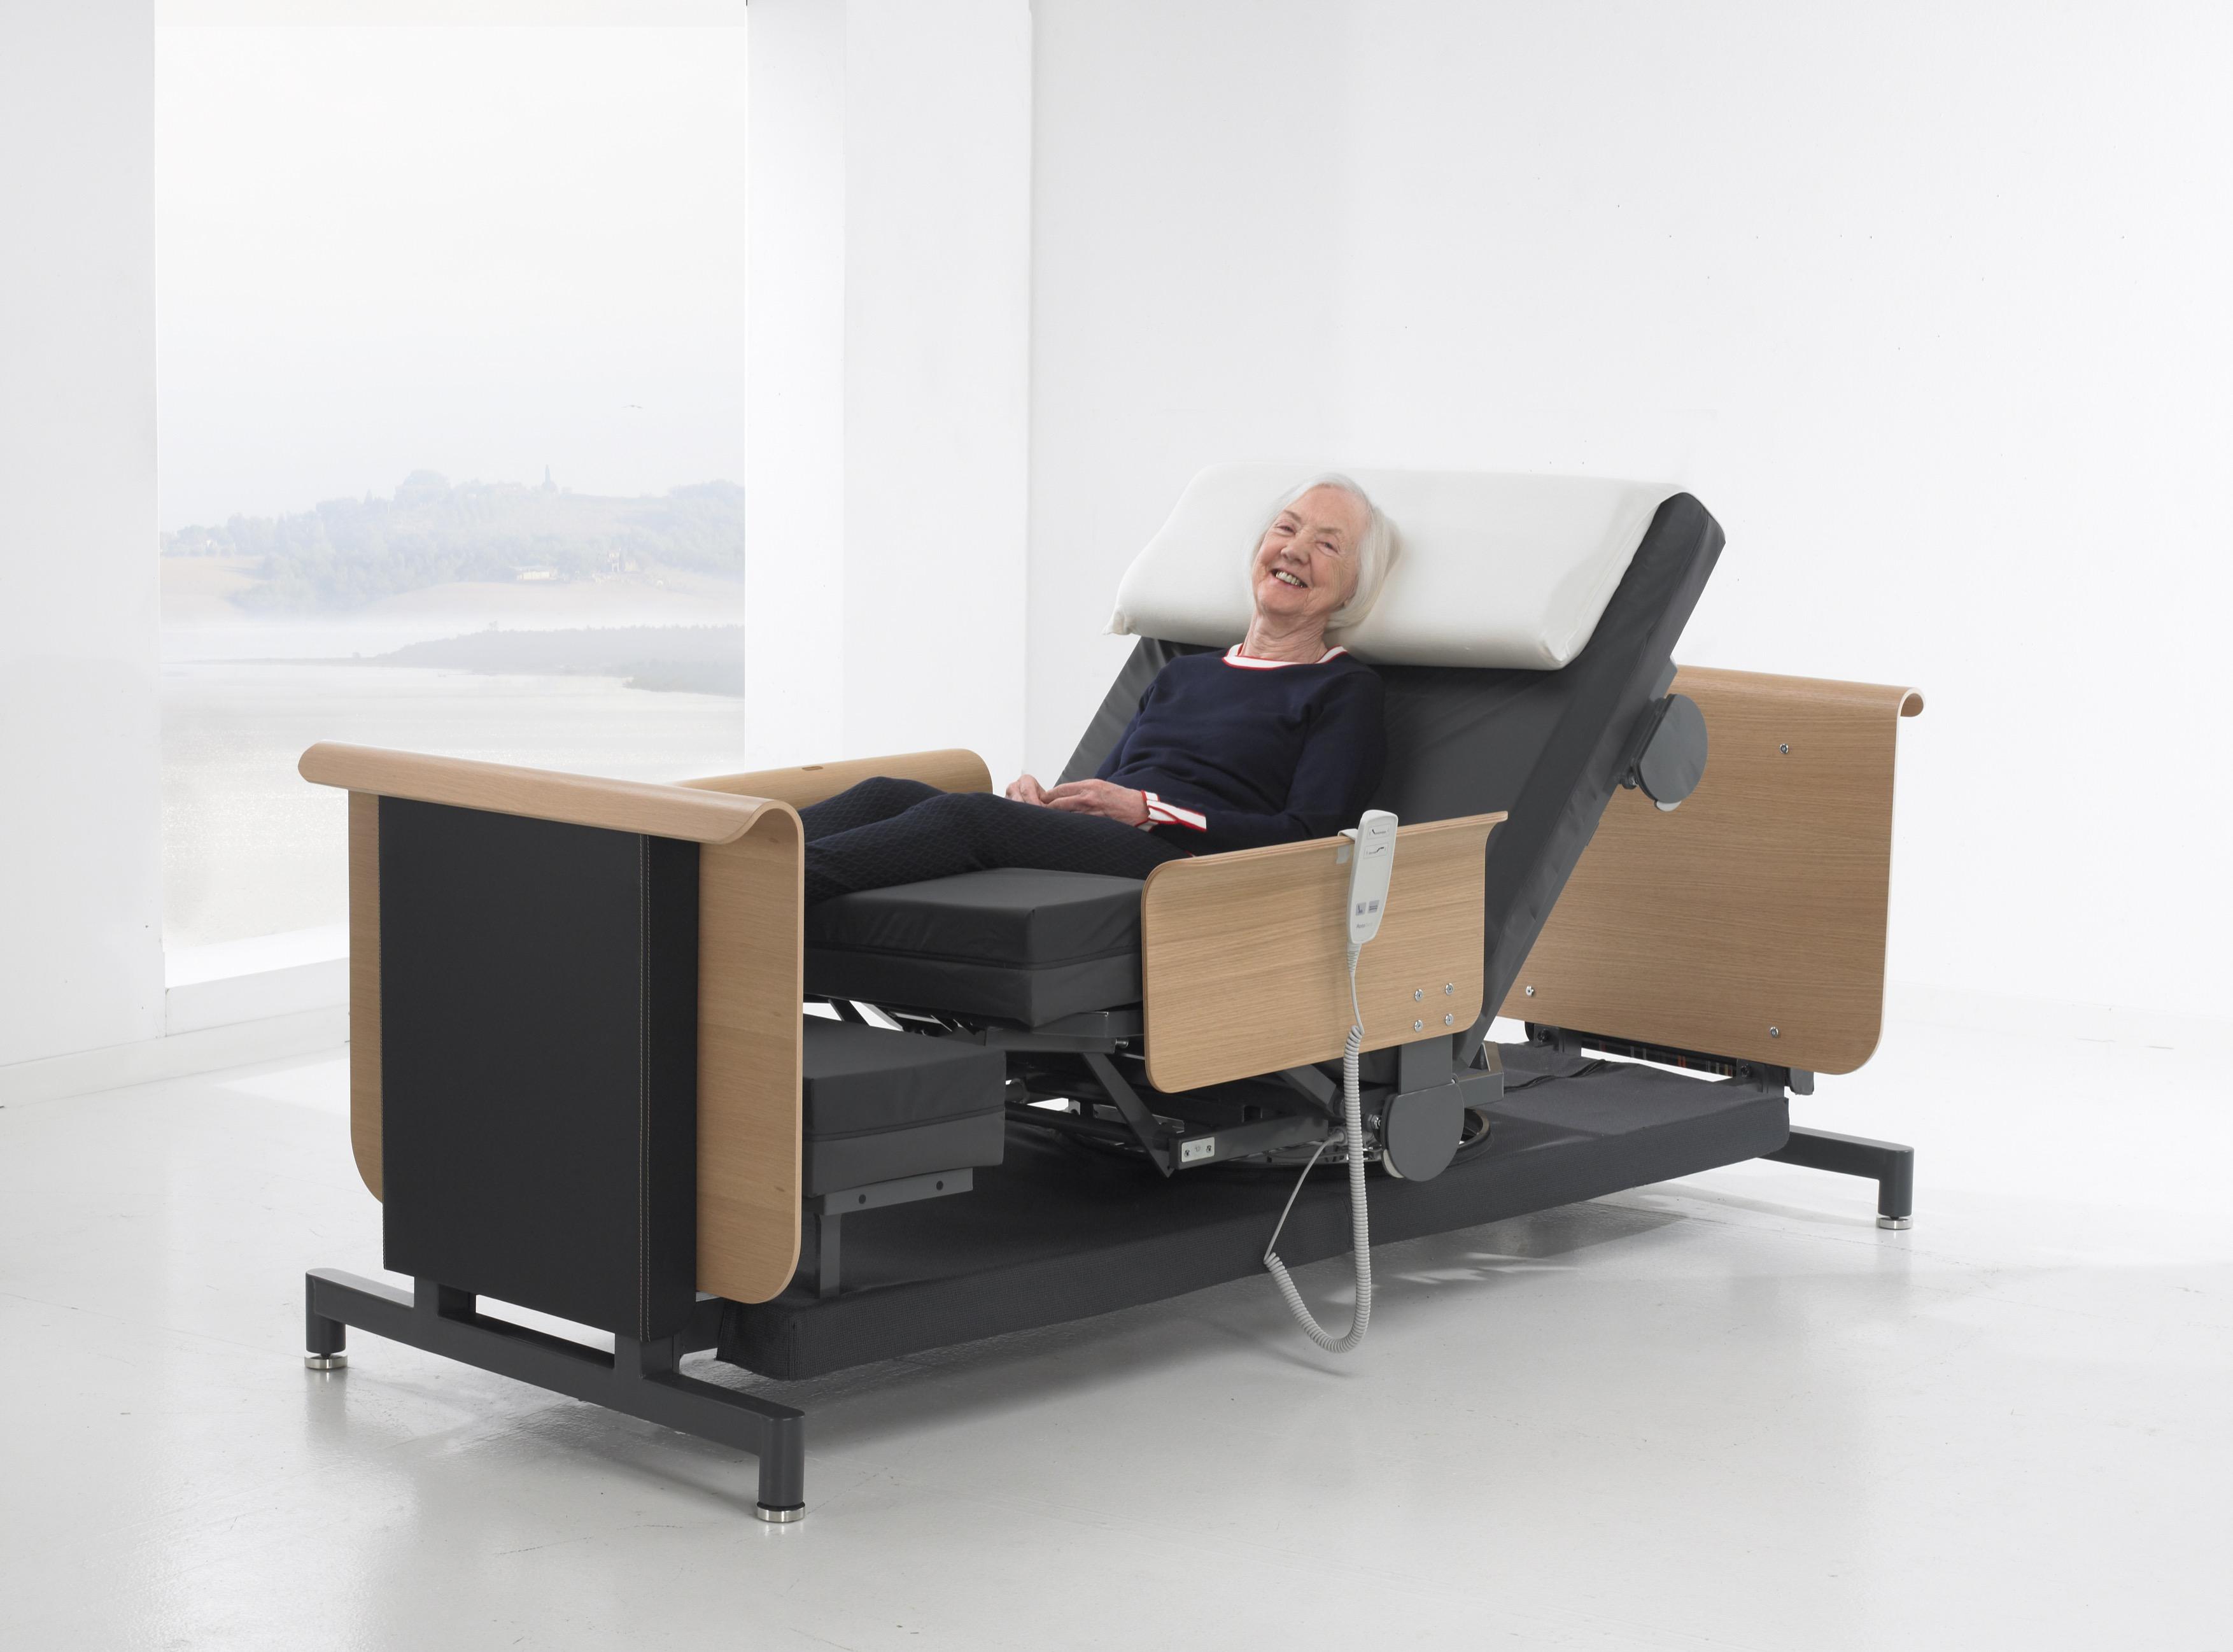 RotoBed Home rotative bed